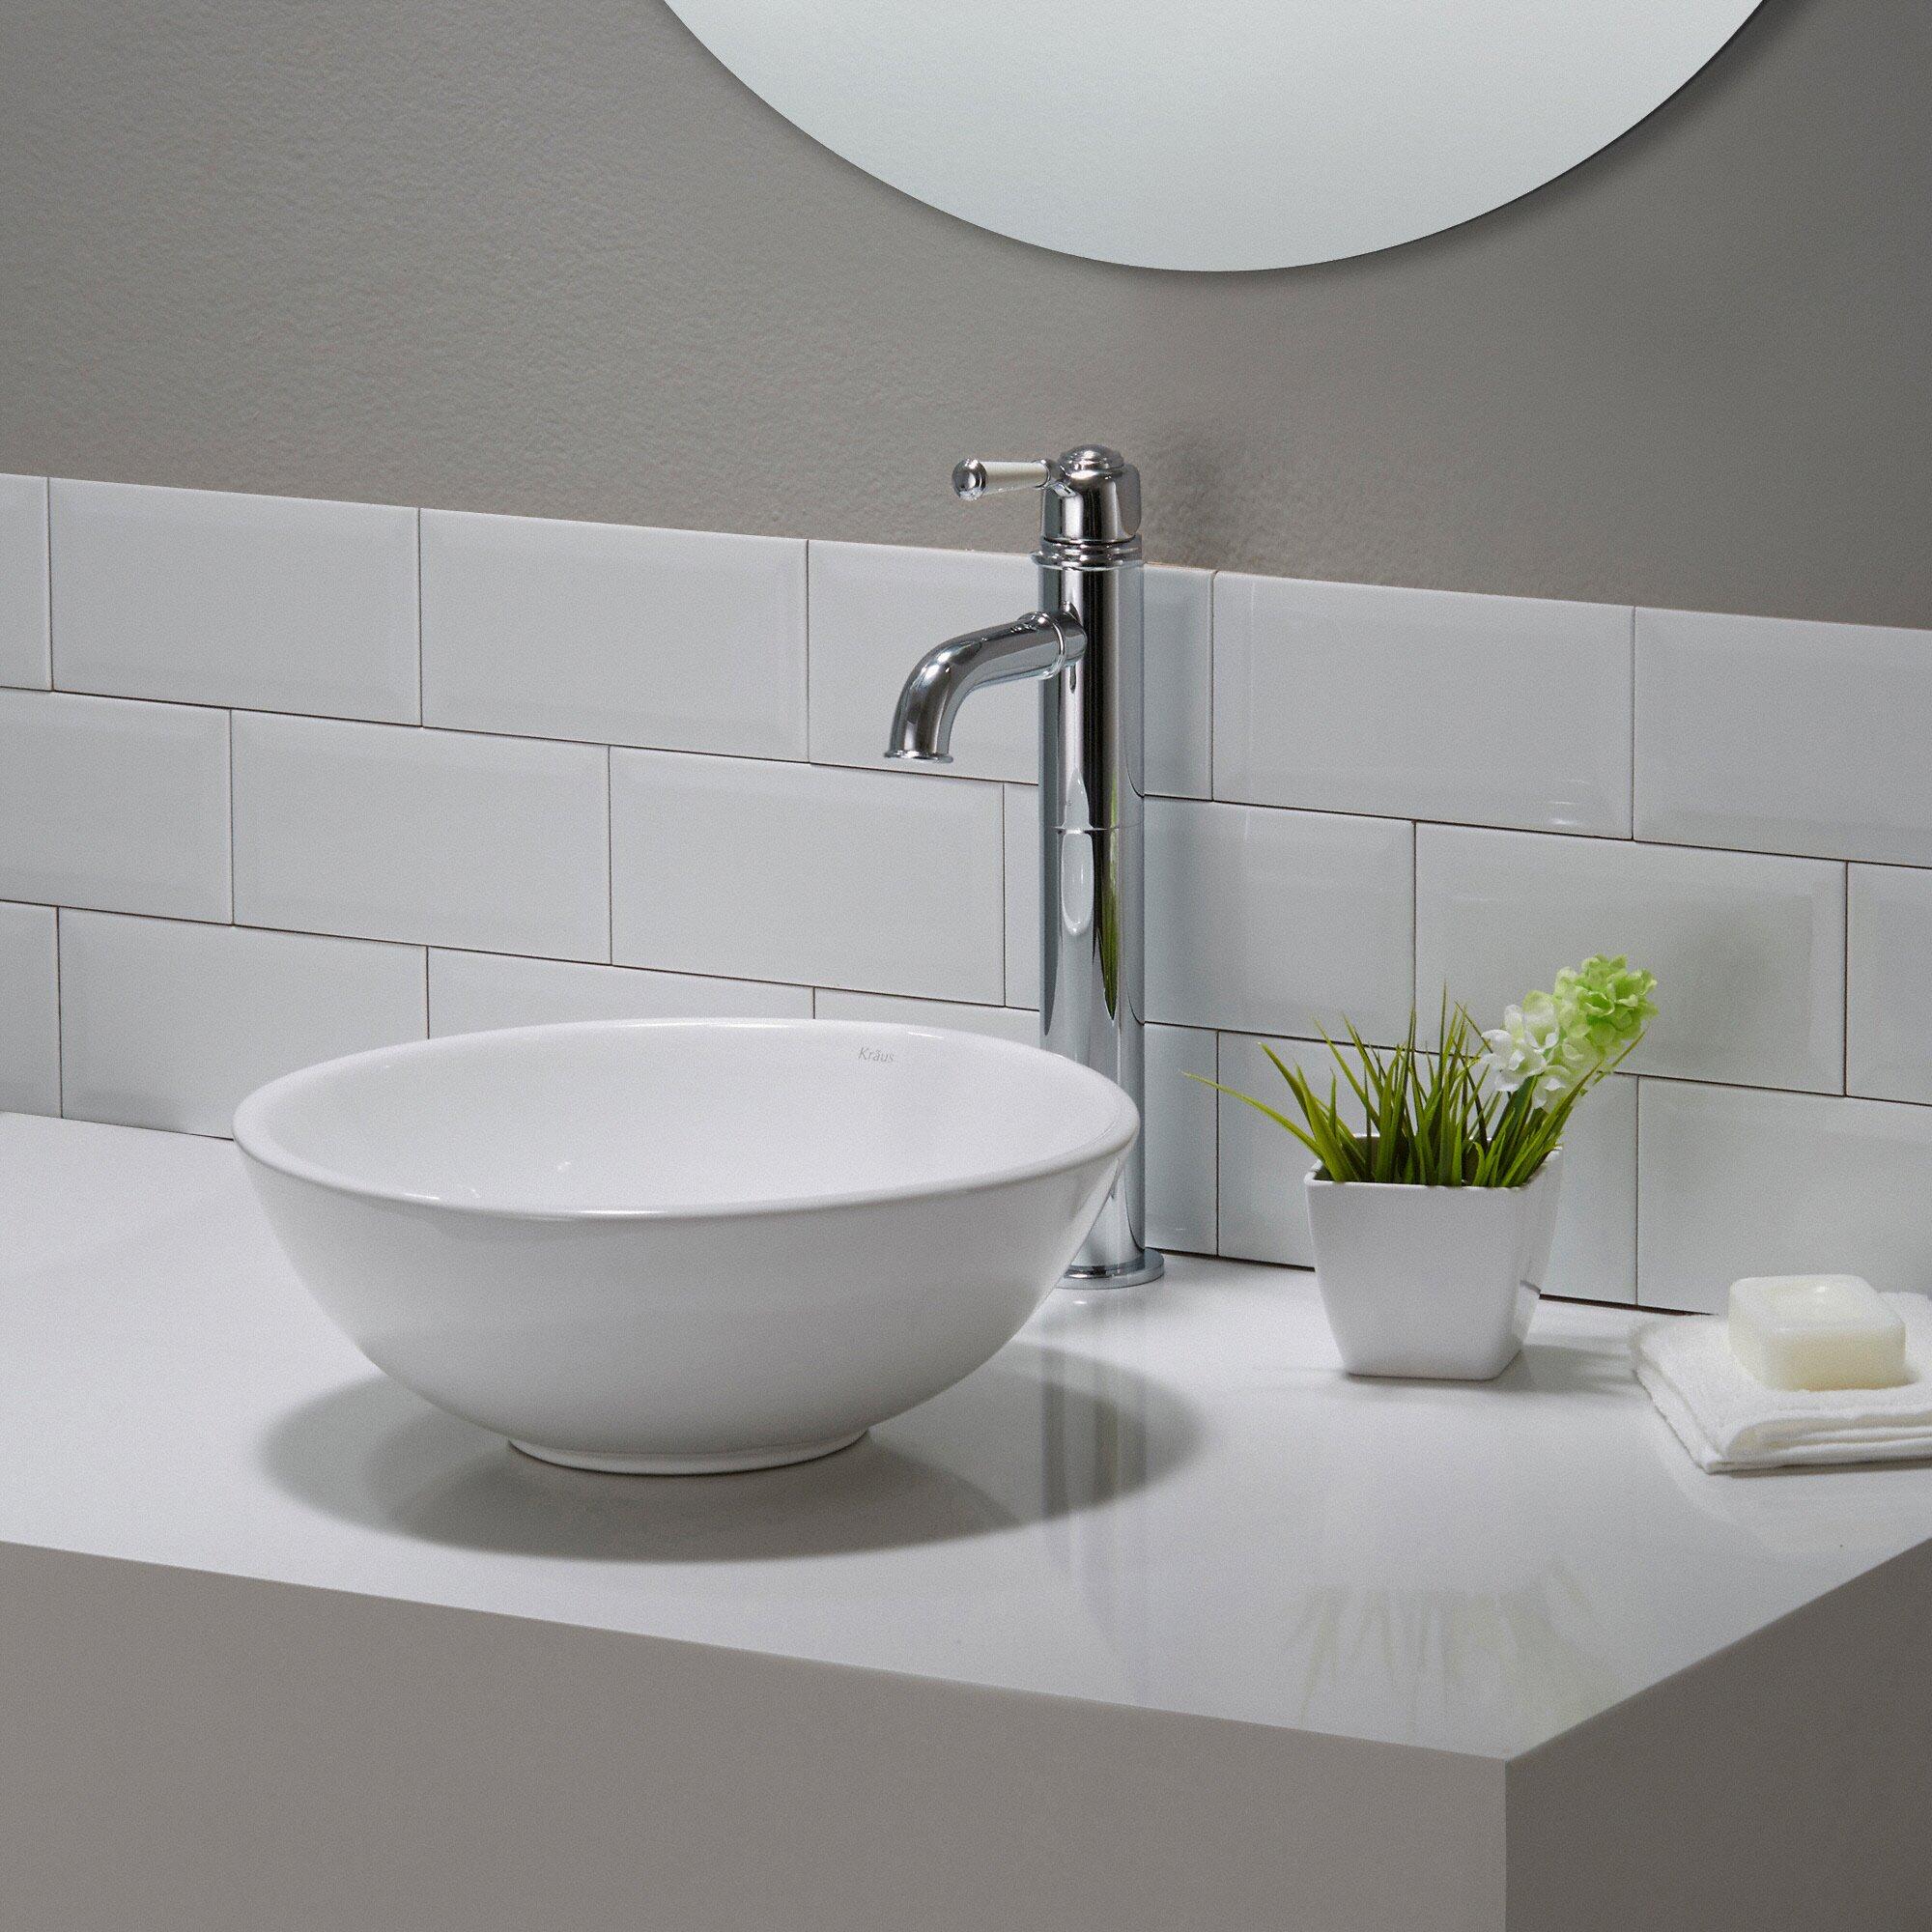 Kraus Bathroom Sinks : Home Improvement Bathroom Fixtures ... Vessel Bathroom Sinks Kraus ...